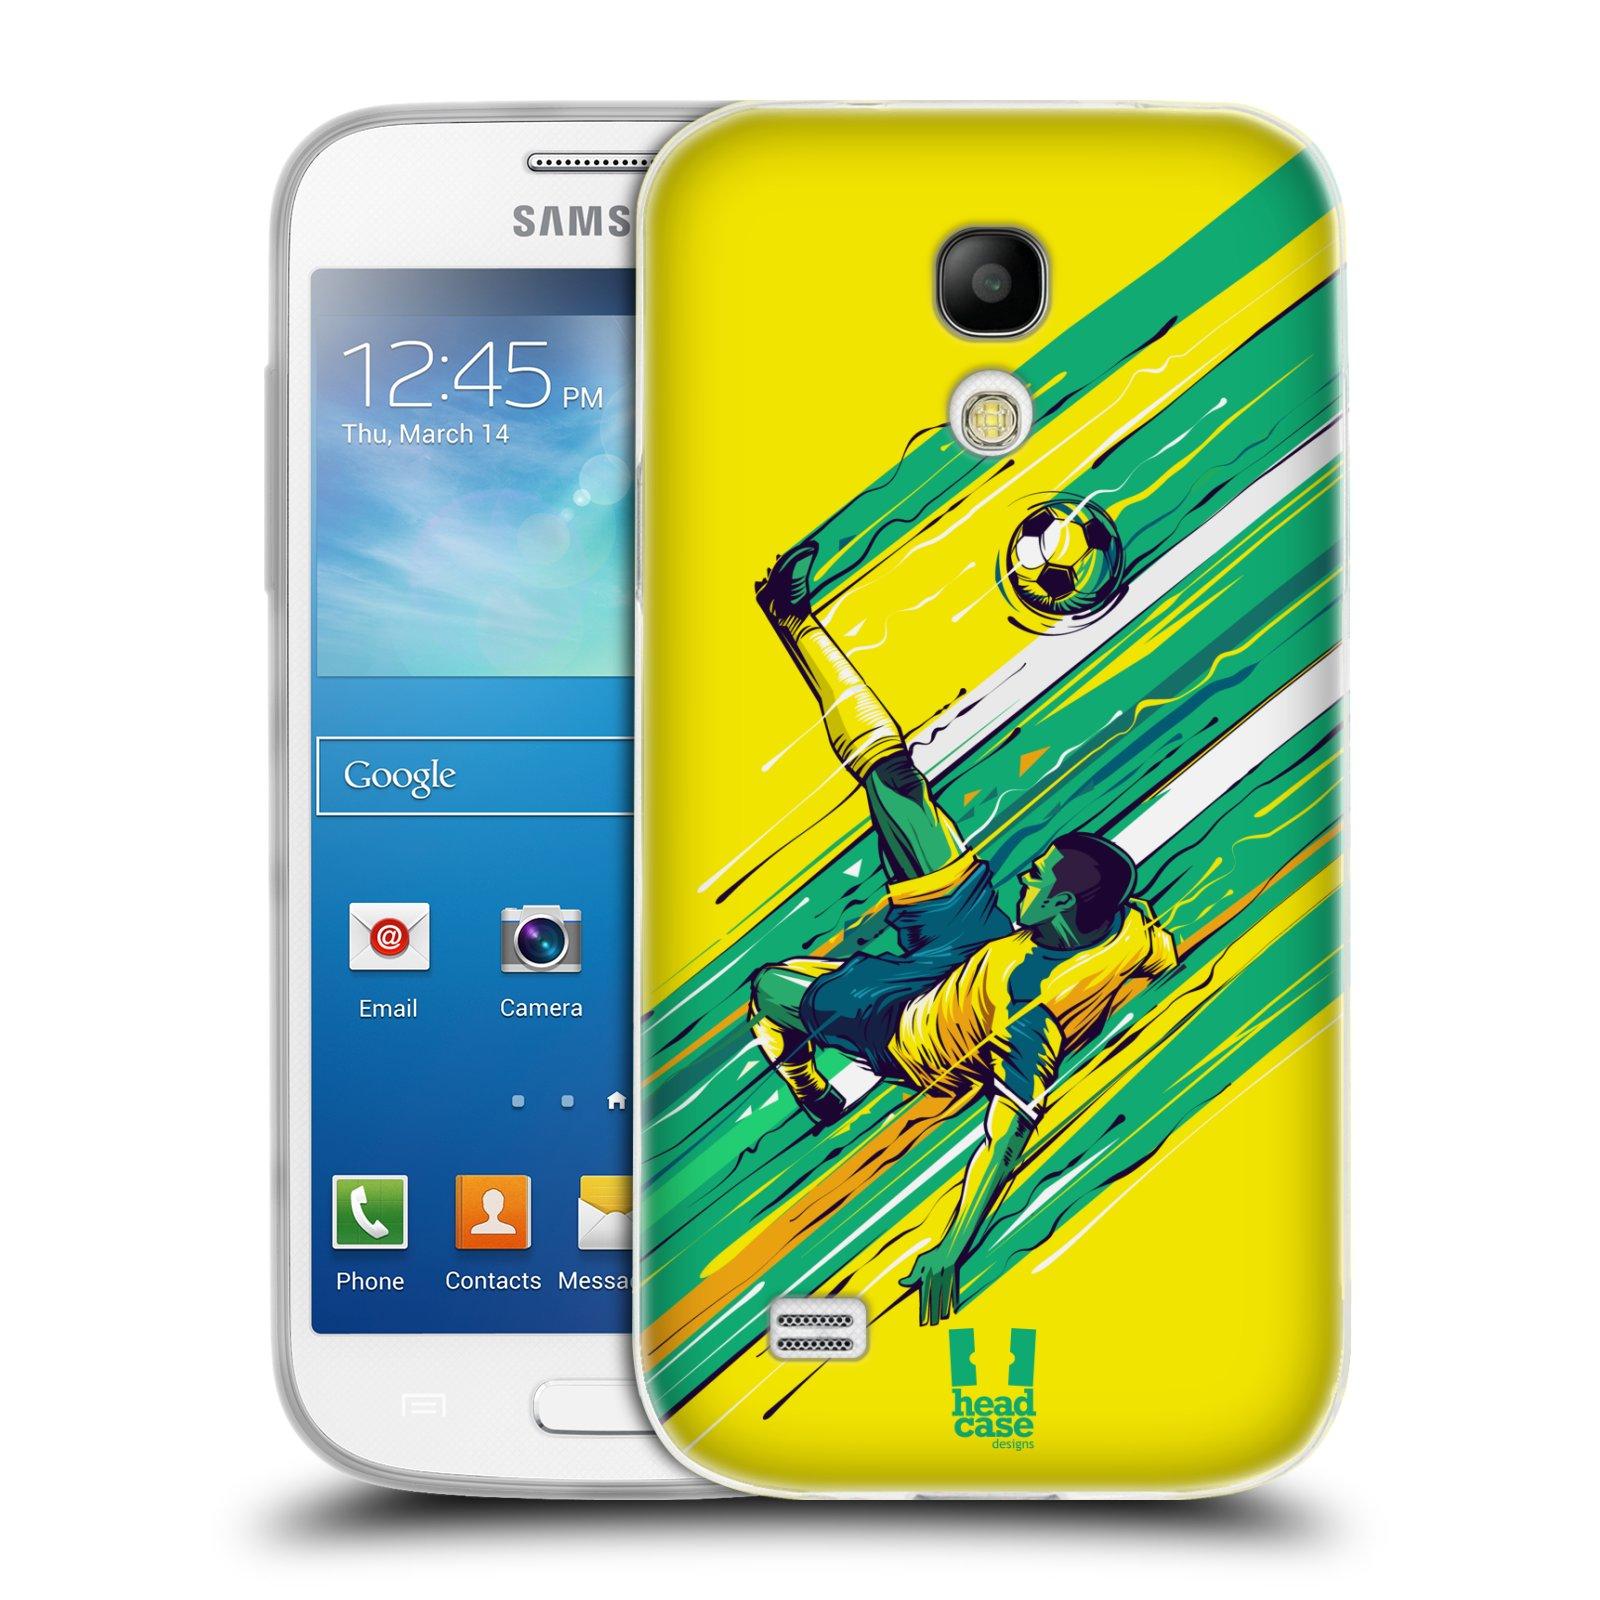 HEAD CASE silikonový obal na mobil Samsung Galaxy S4 MINI Sport fotbal kreslený nůžky